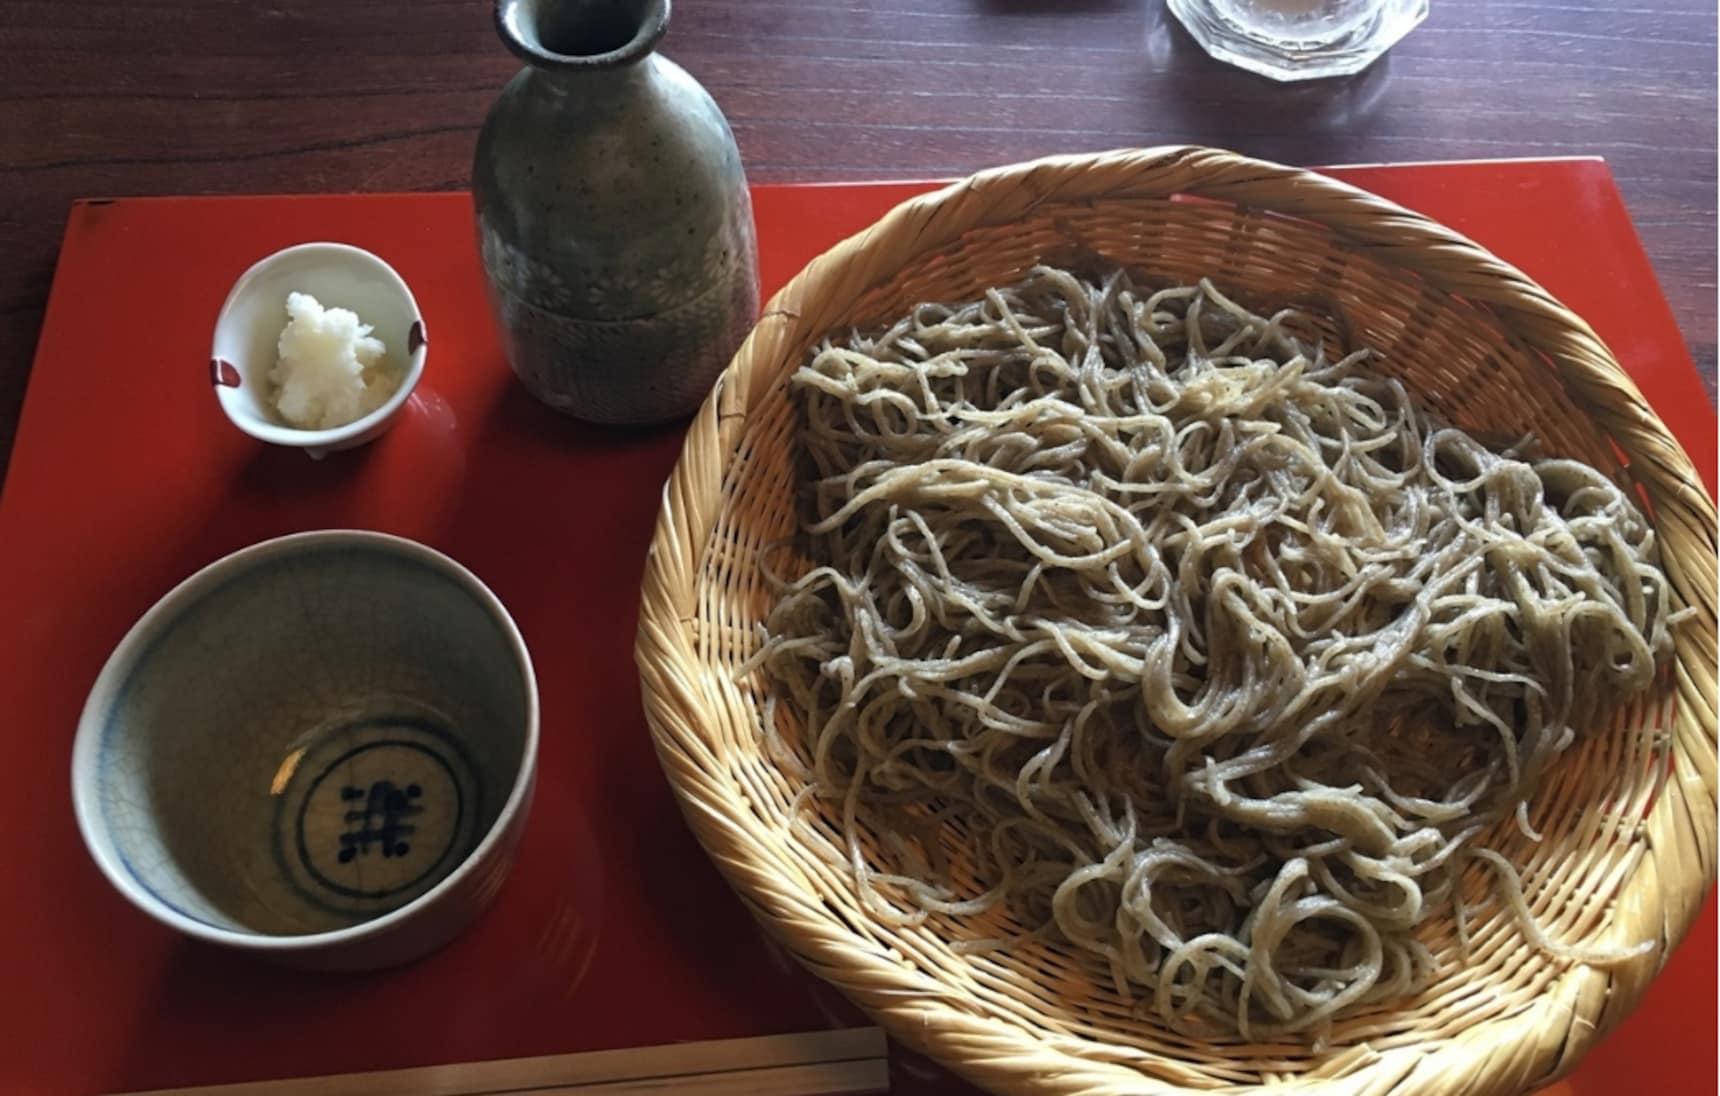 Nara's Top 5 Michelin-Starred Restaurants